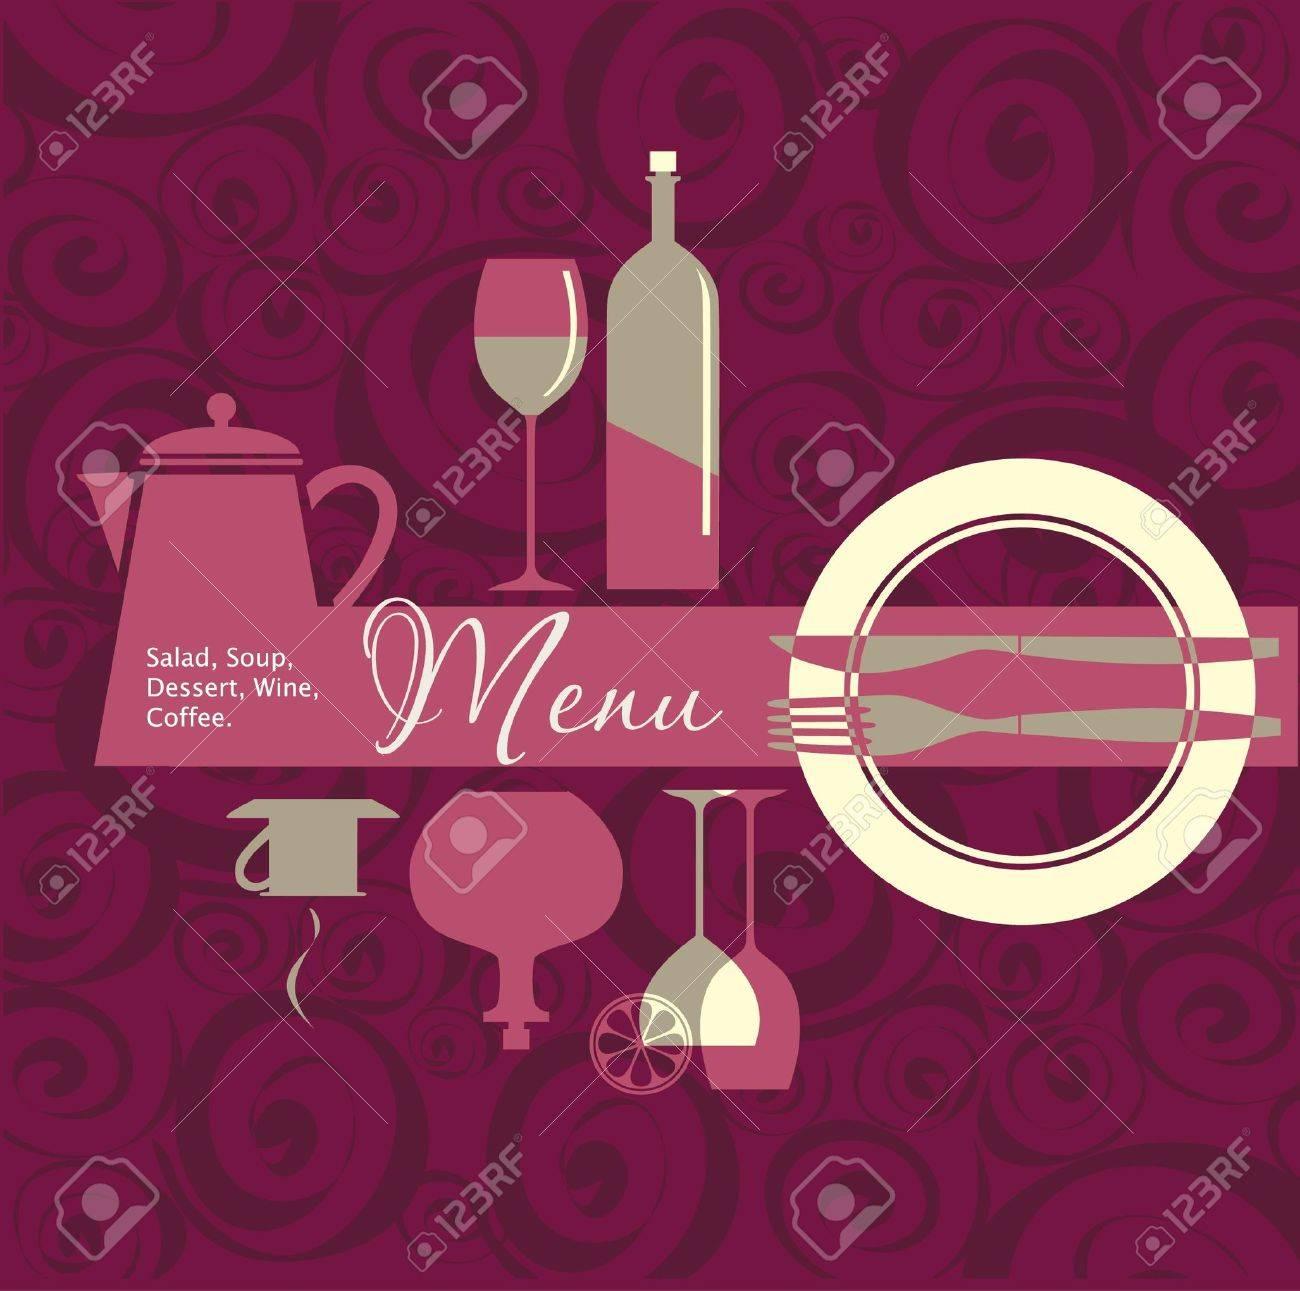 Menu for restaurant, cafe, bar, coffeehouse Stock Vector - 12874584